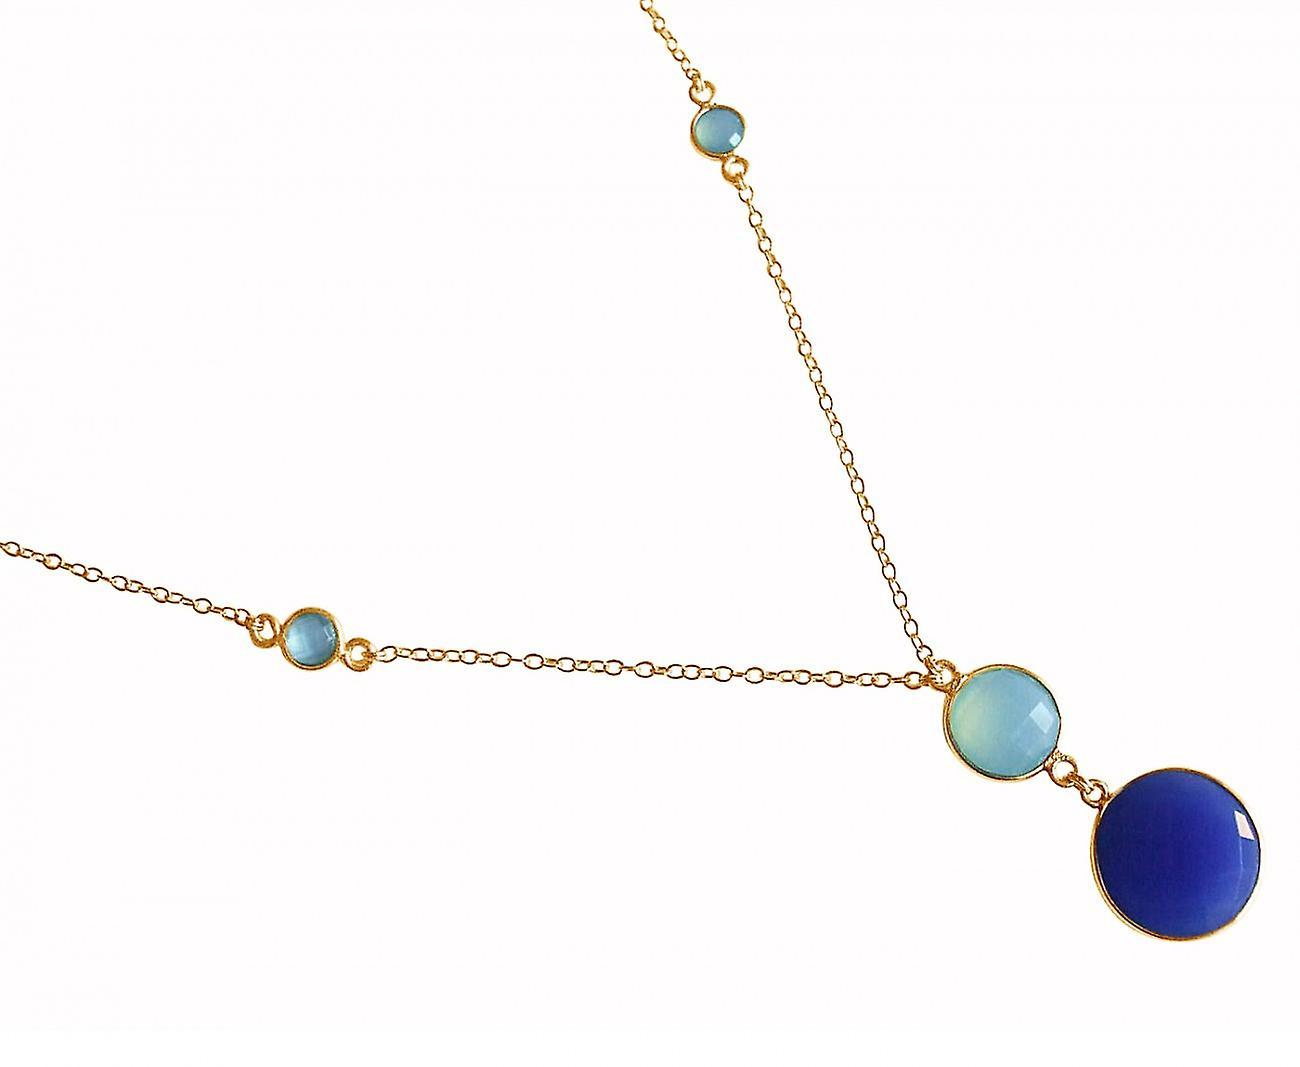 Gemshine - femmes - Halskette - Anhänger - 925 argent Veroret - Chalzedon - Saphir - Meeresvert - bleu - 45cm